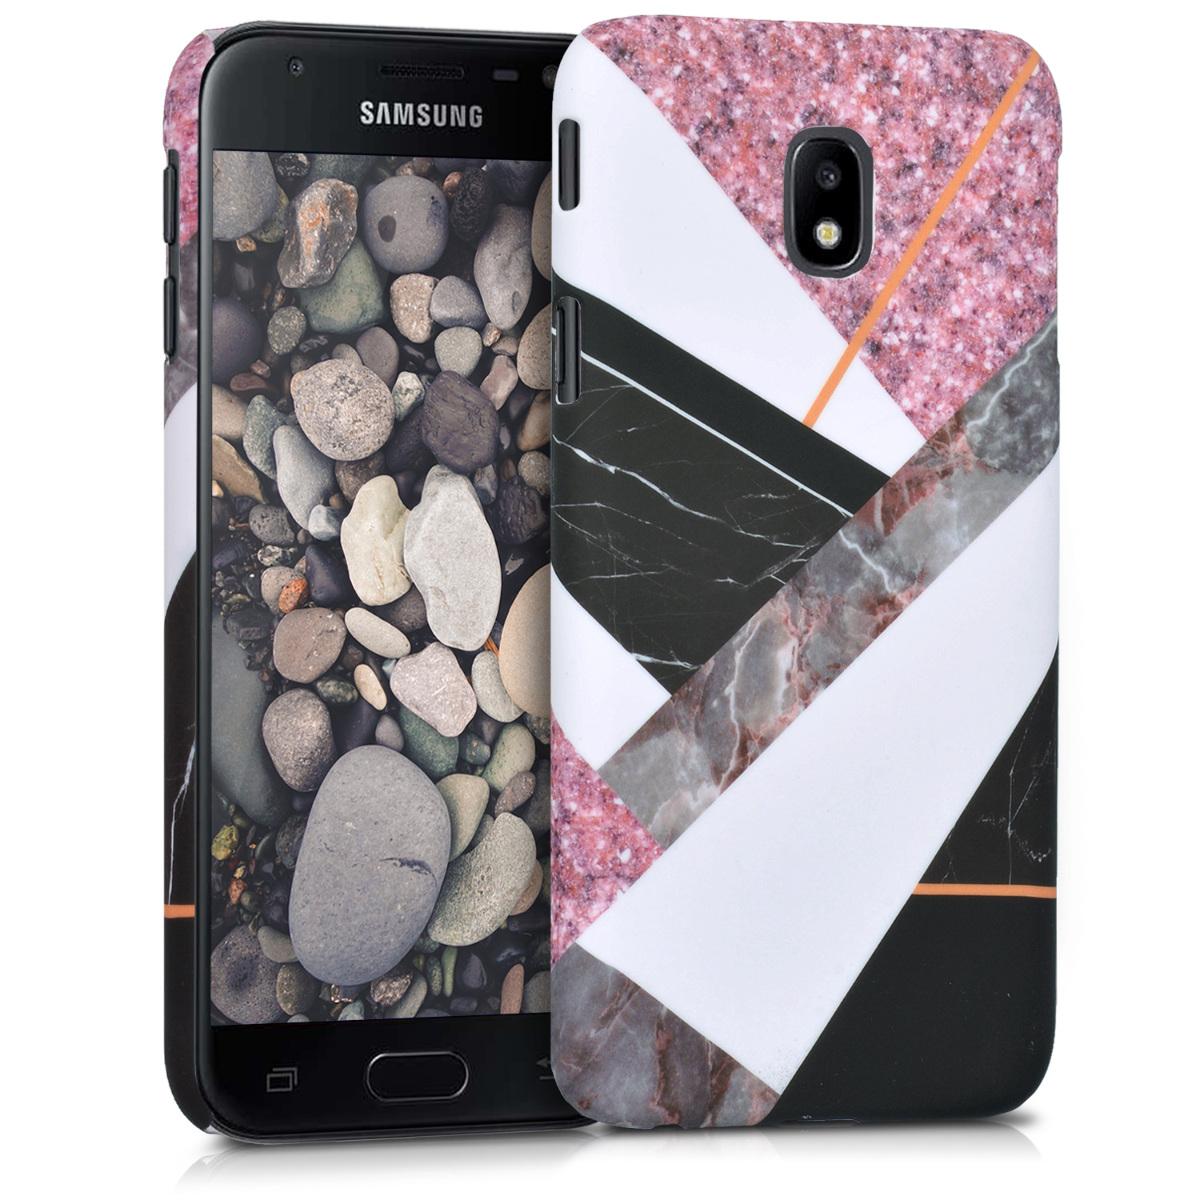 KW Slim Anti-Slip Cover - Σκληρή Θήκη Καουτσούκ Samsung Galaxy J3 (2017) - Πολύχρωμη- Γεωμετρικό σχέδιο (41467.01)